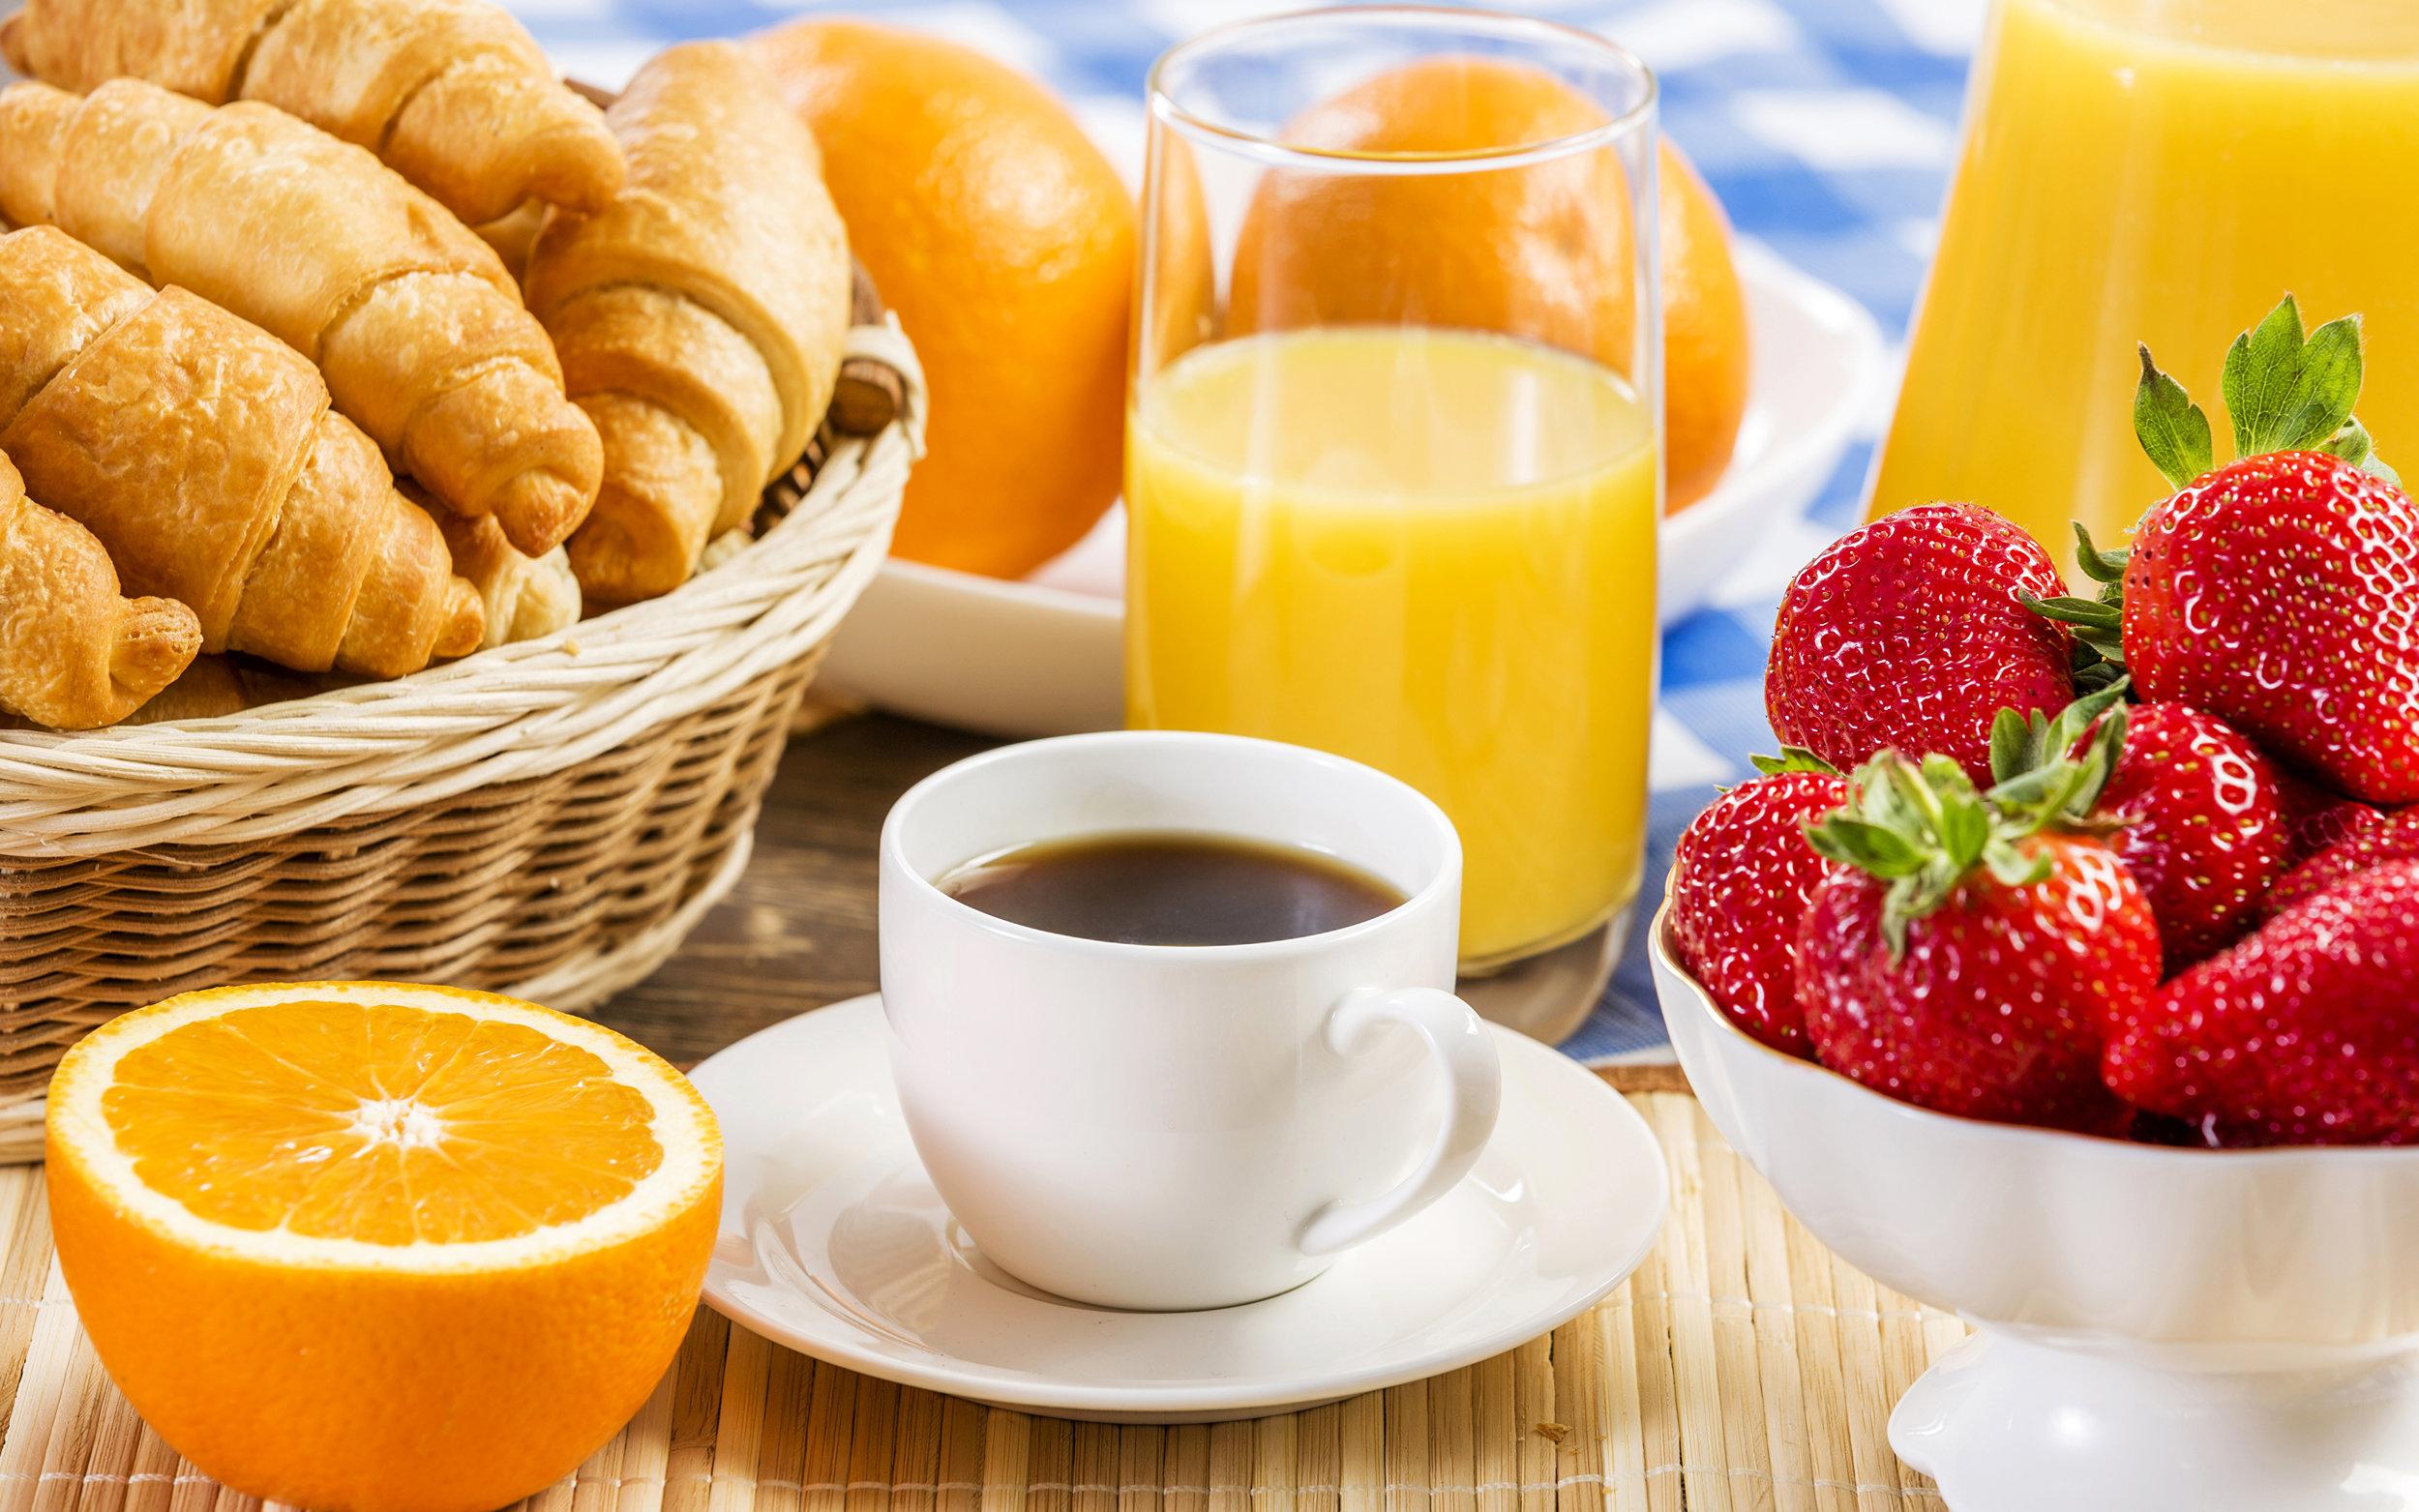 Coffee_Juice_Croissant_494449_3840x2400.jpg